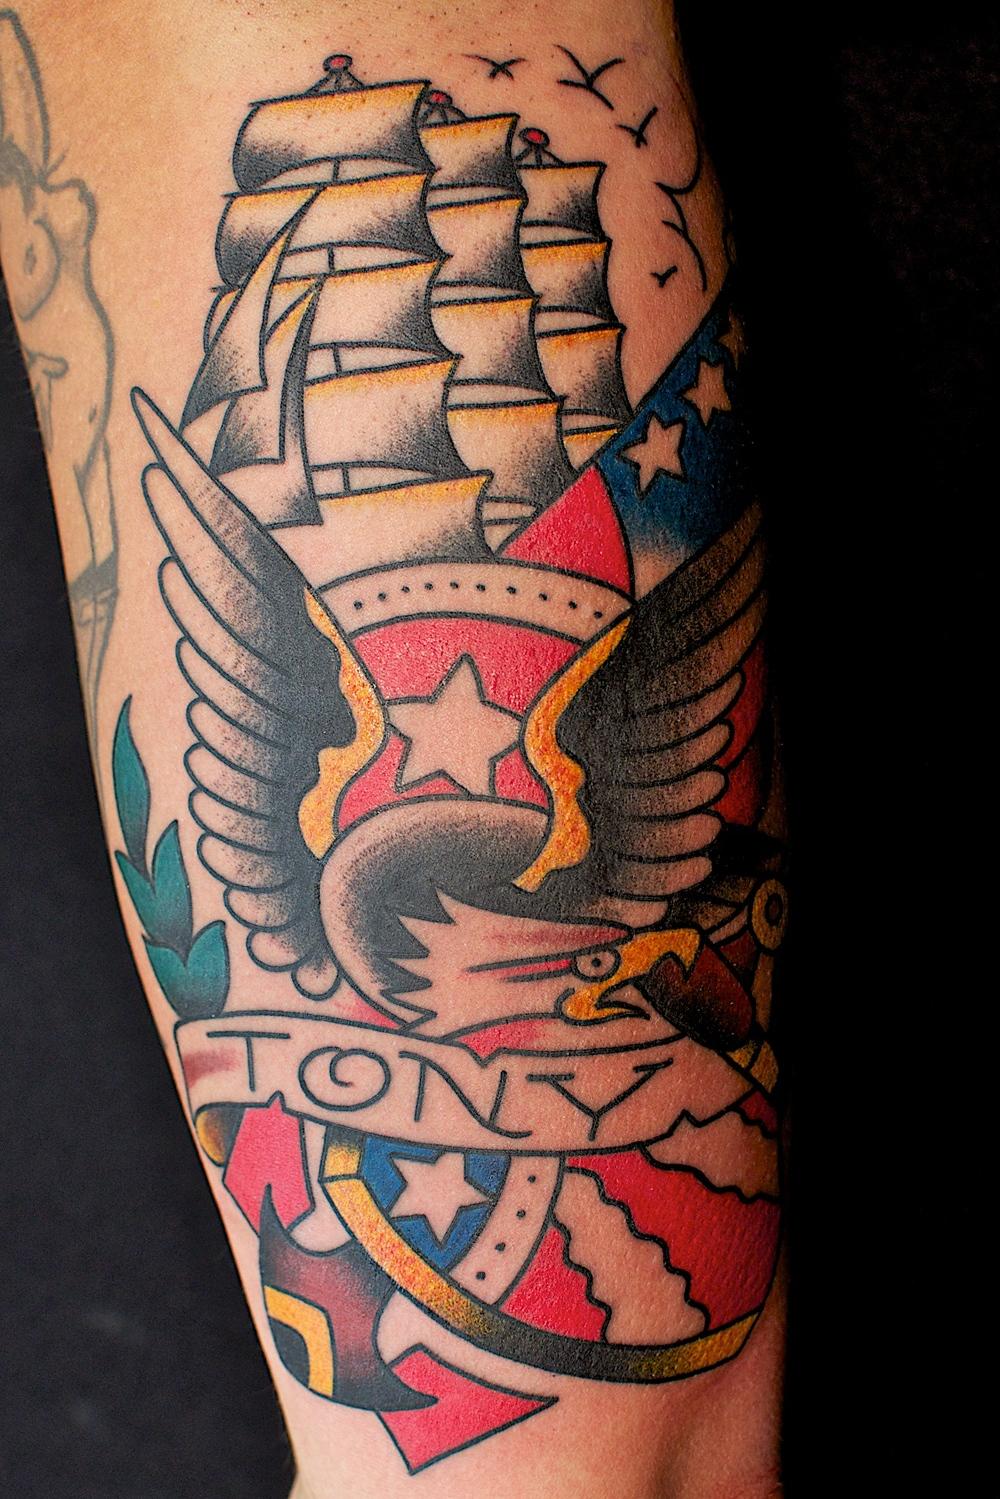 01032012 Tattoos 01 5.jpg